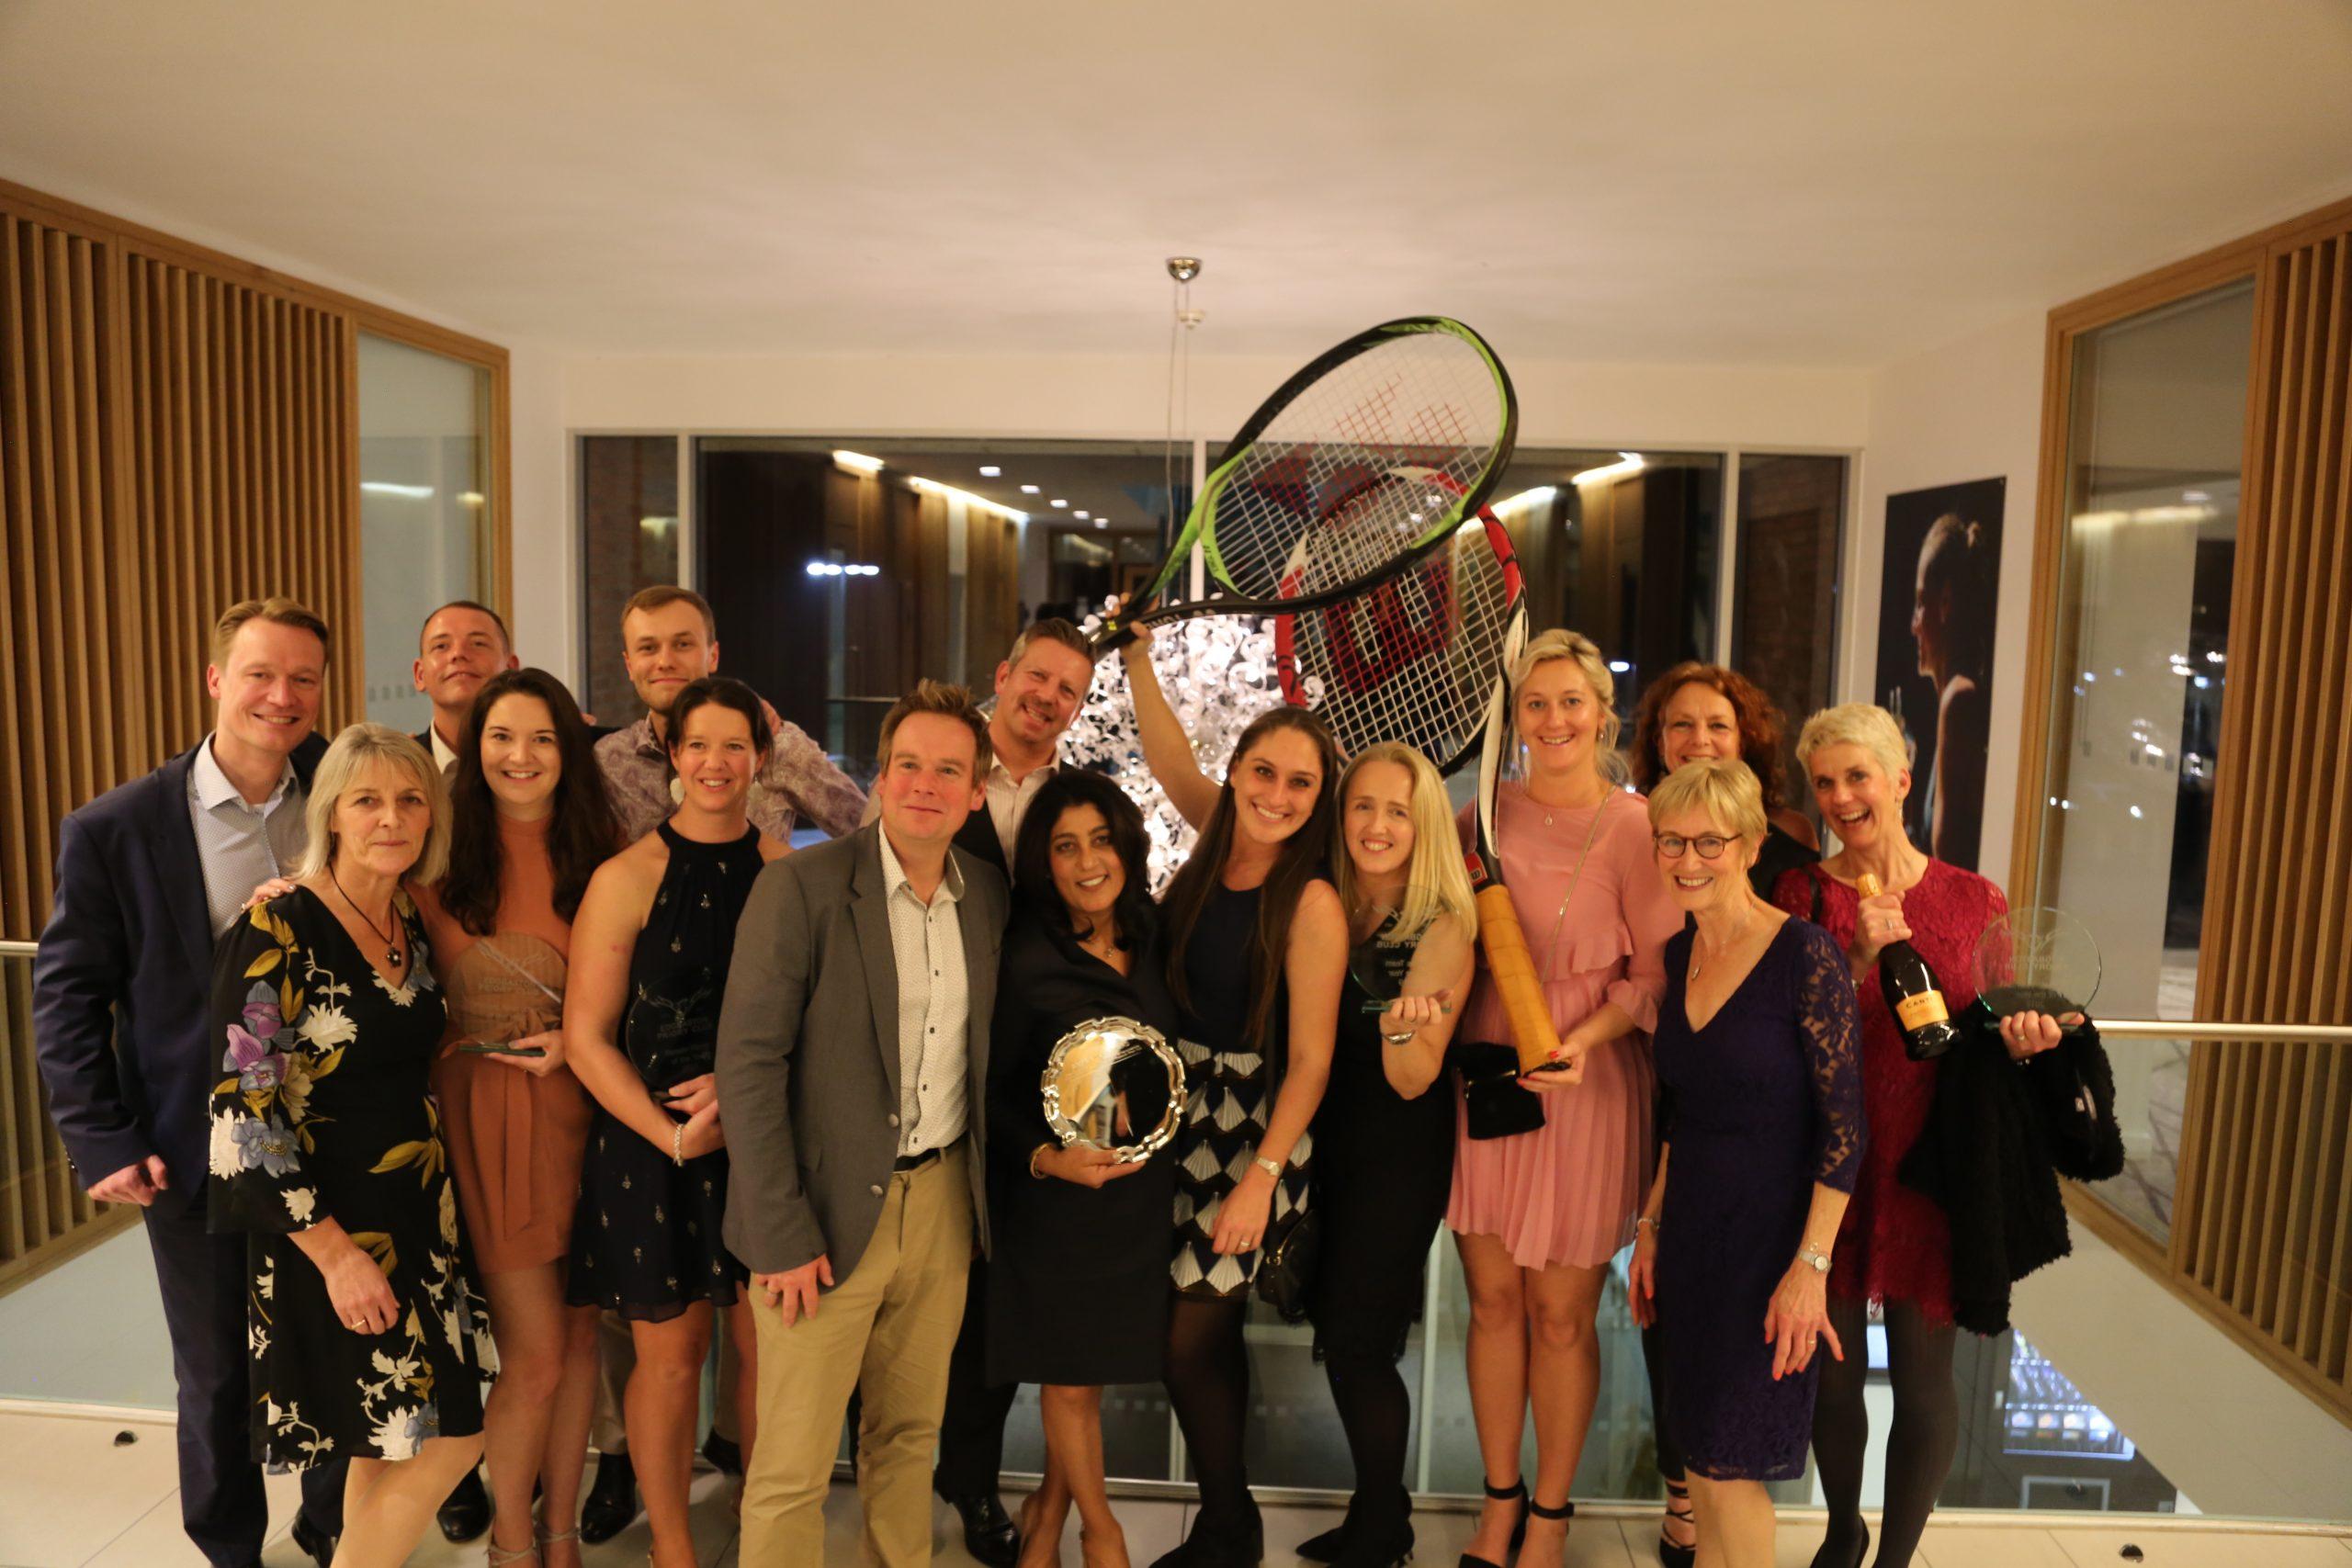 Tennis Awards winners